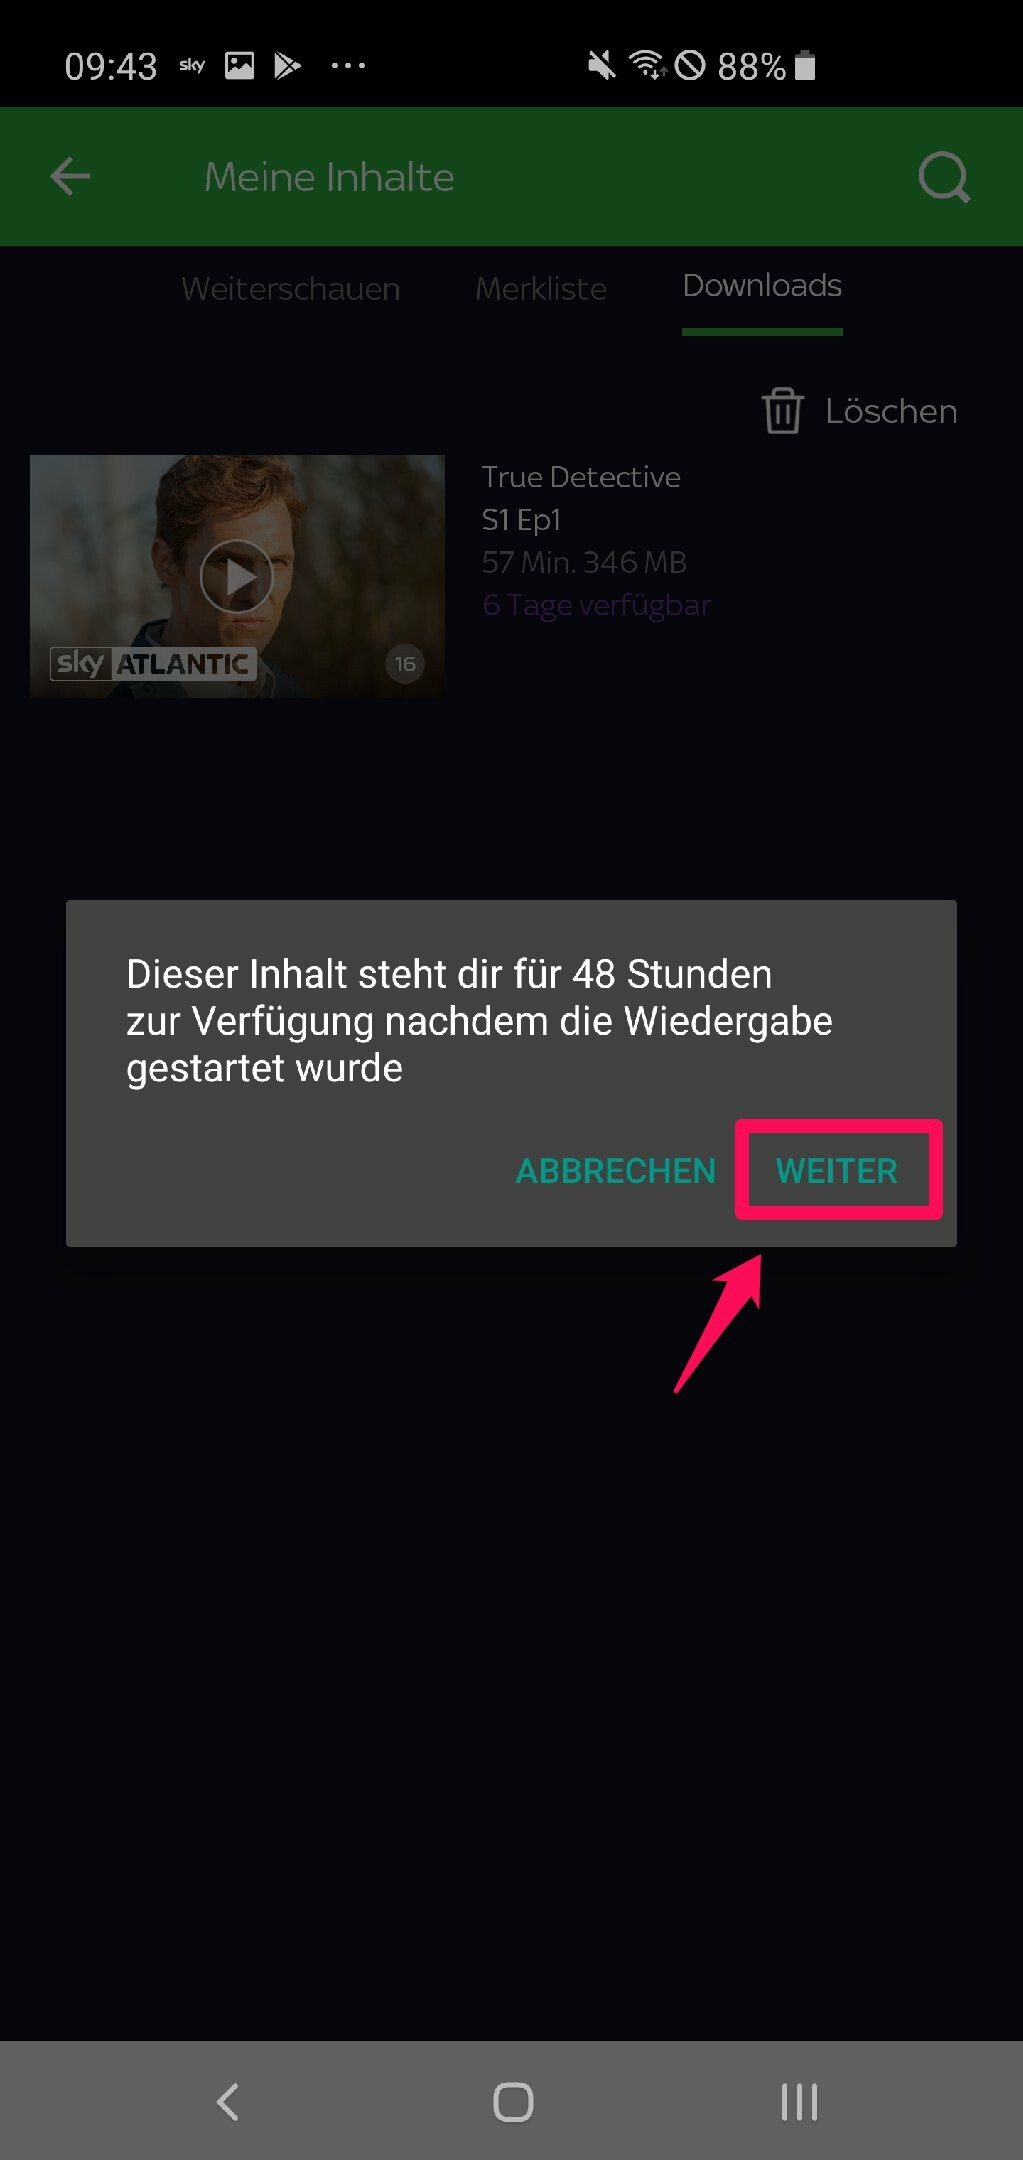 sky ticket app download löschen